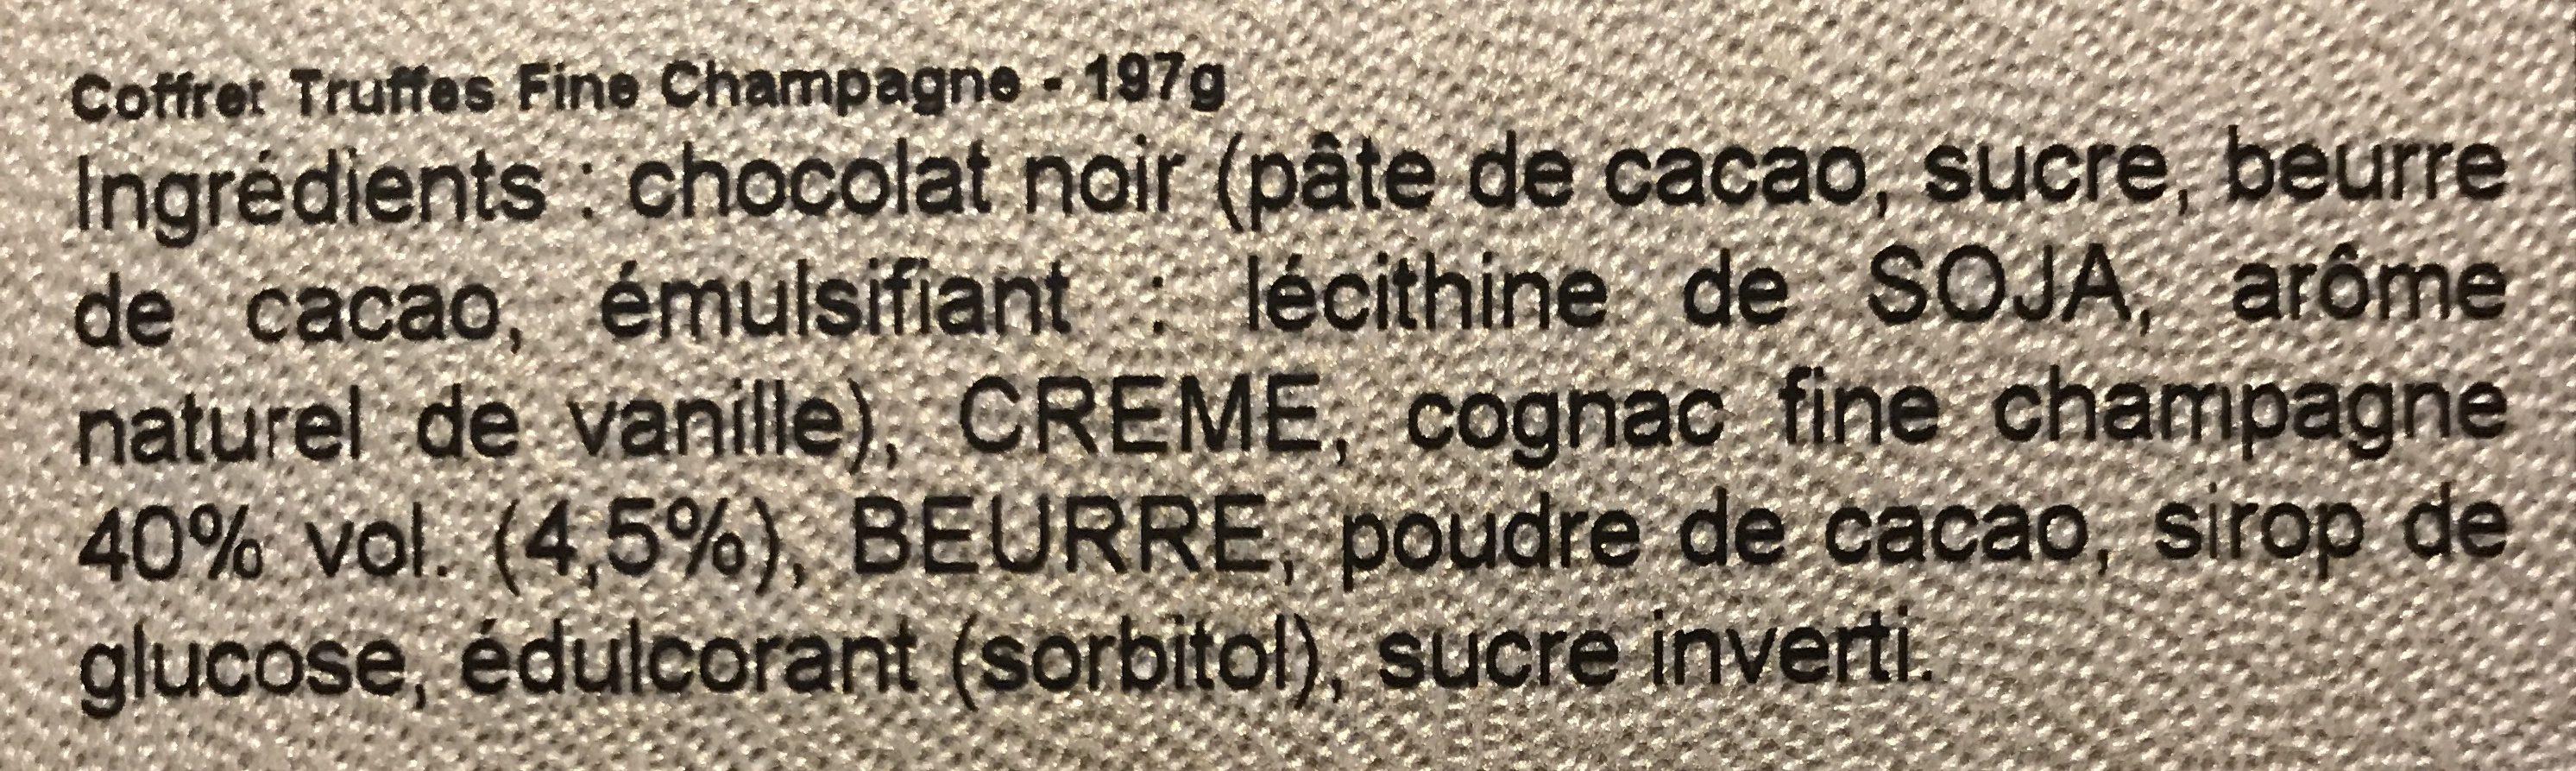 Coffret Truffe Fine Champagne - Ingrédients